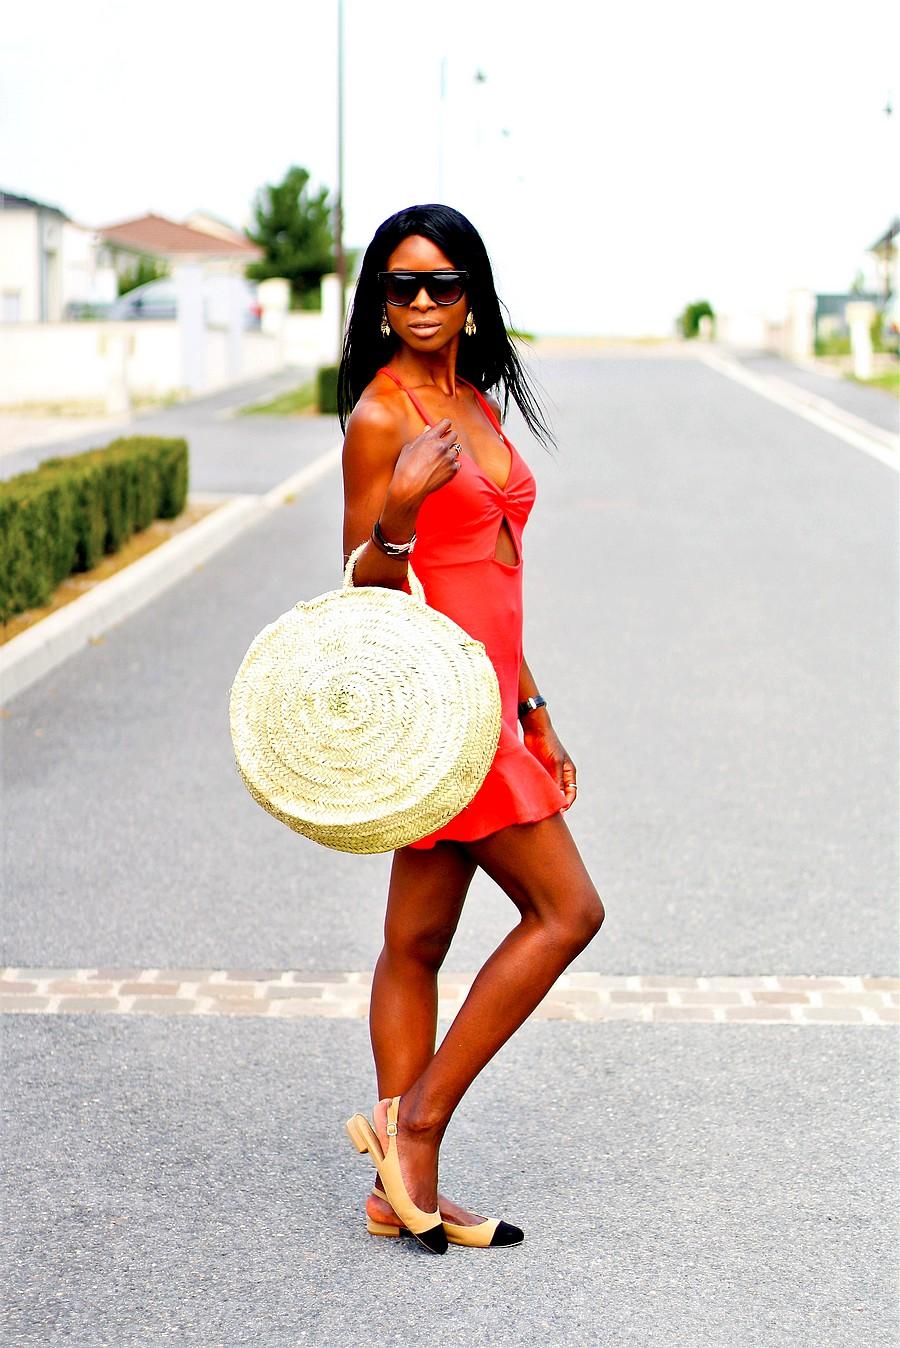 lunettes-celine-kim-kardashian-robe-rouge-volants-slingback-style-chanel